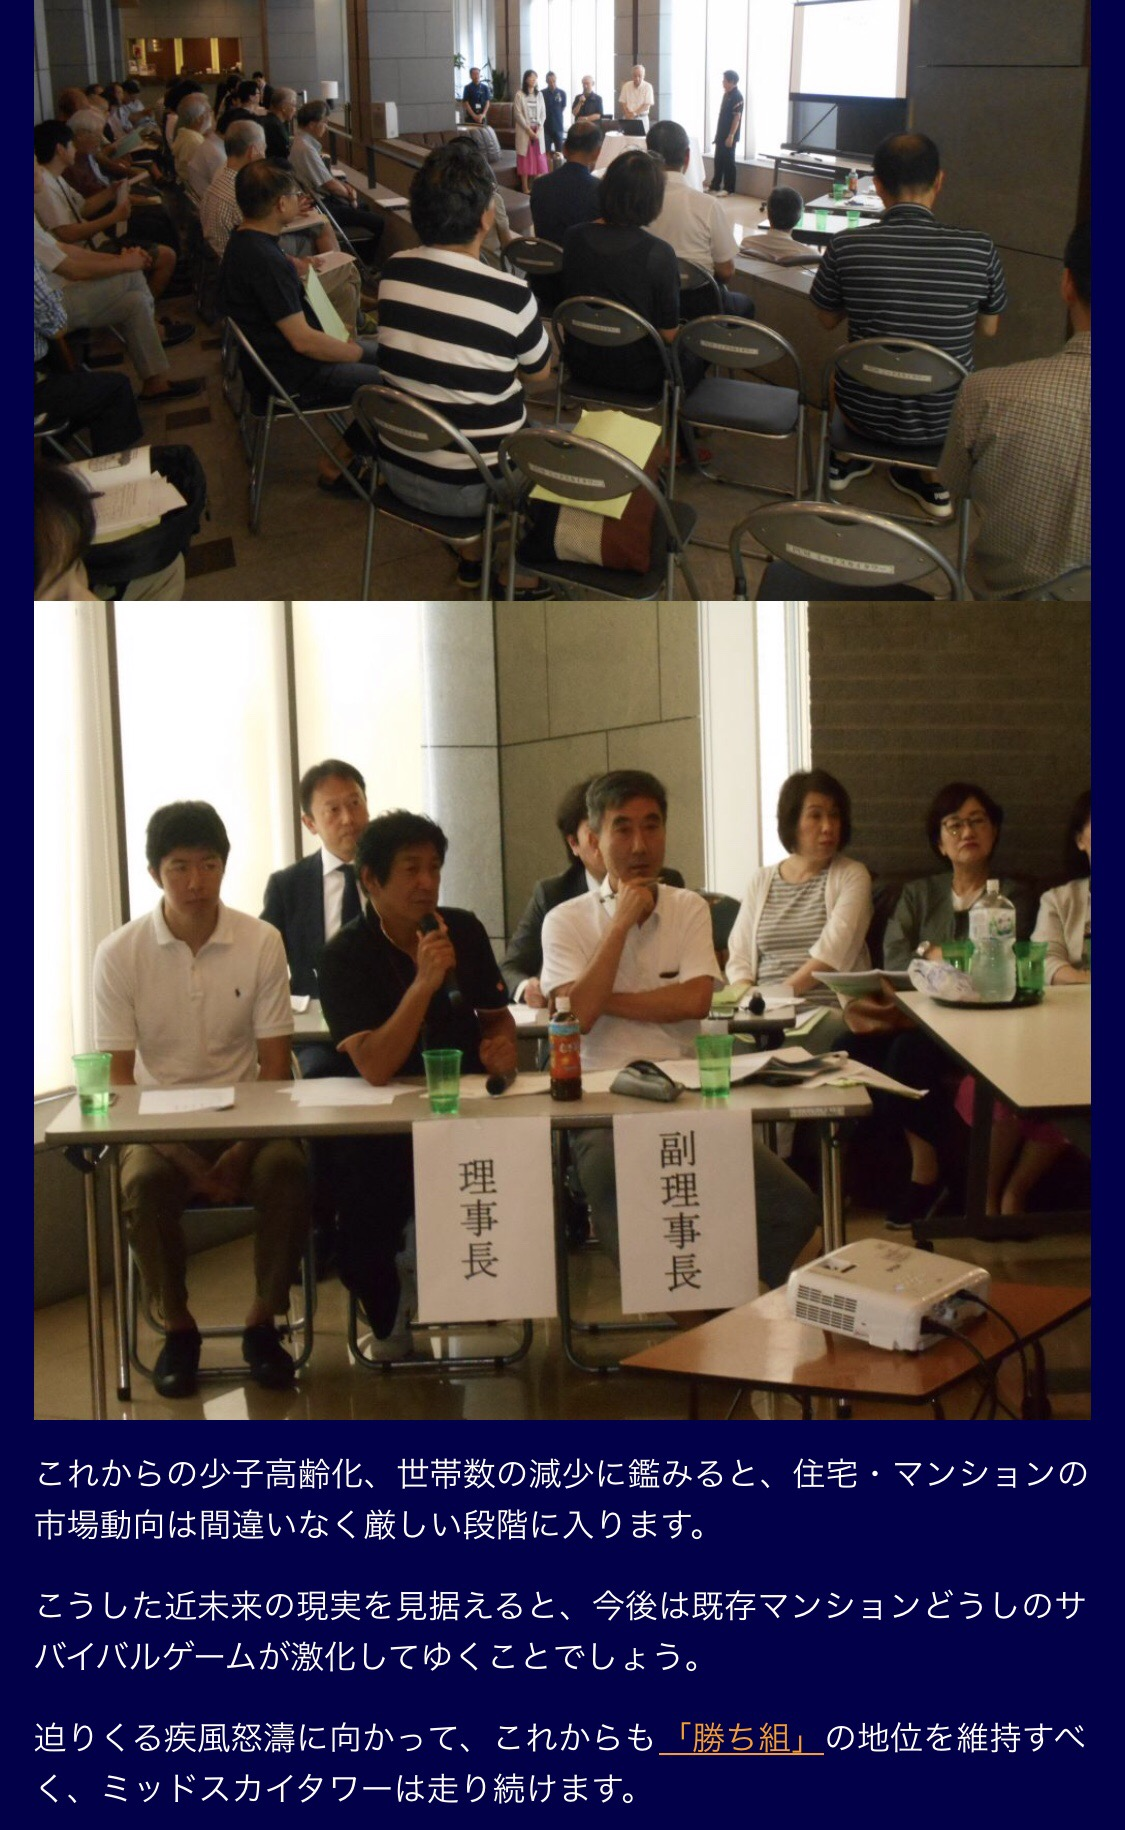 人災 不可抗力 水害 多摩川 司法に関連した画像-03